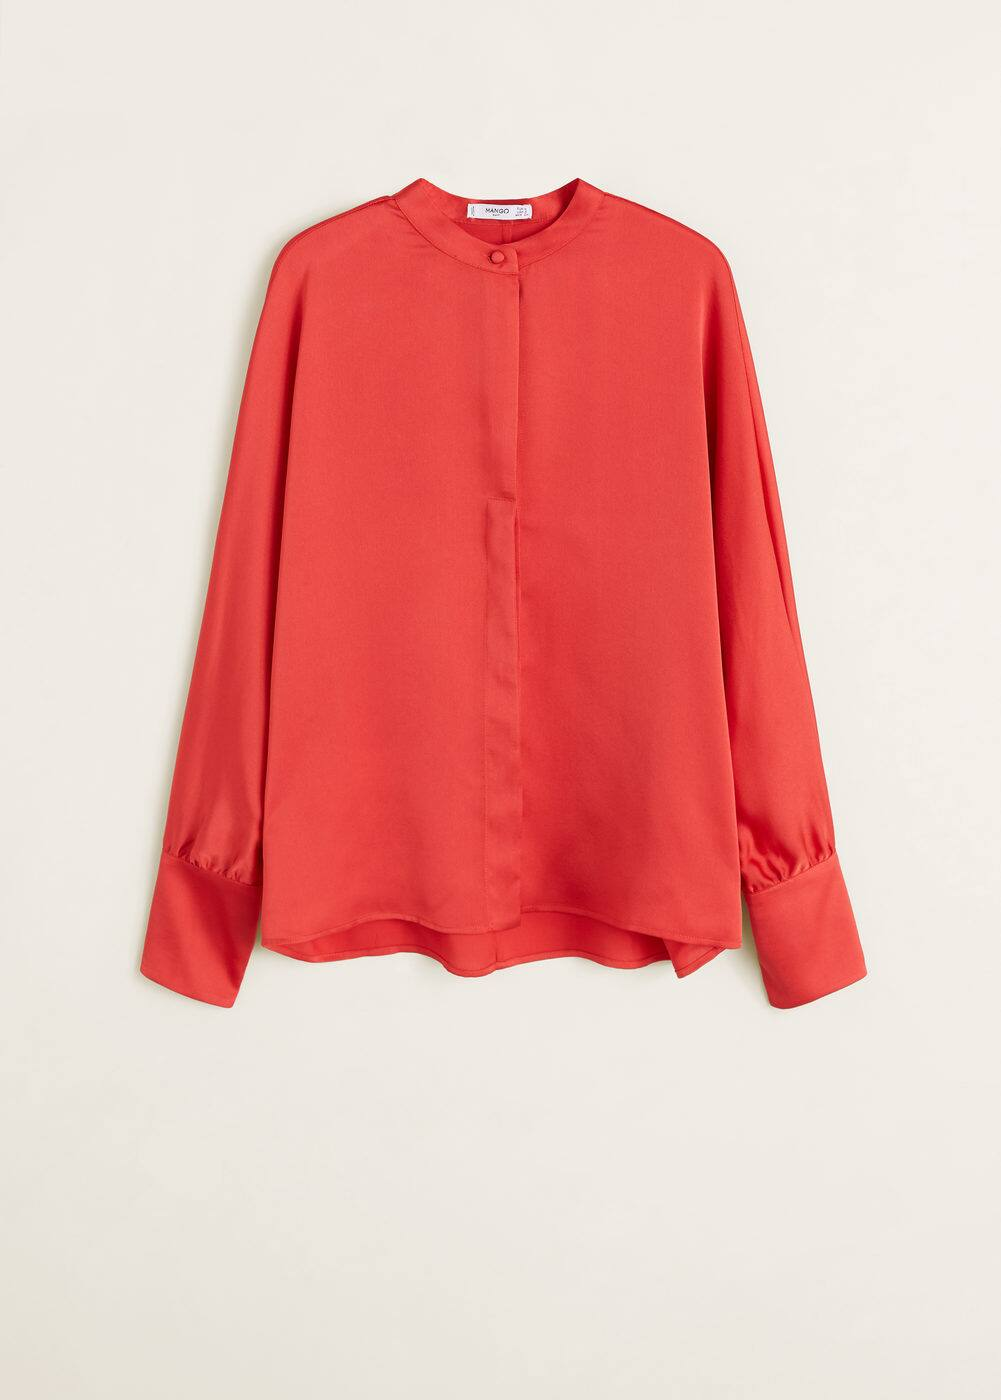 Mango - Satin blouse - 7